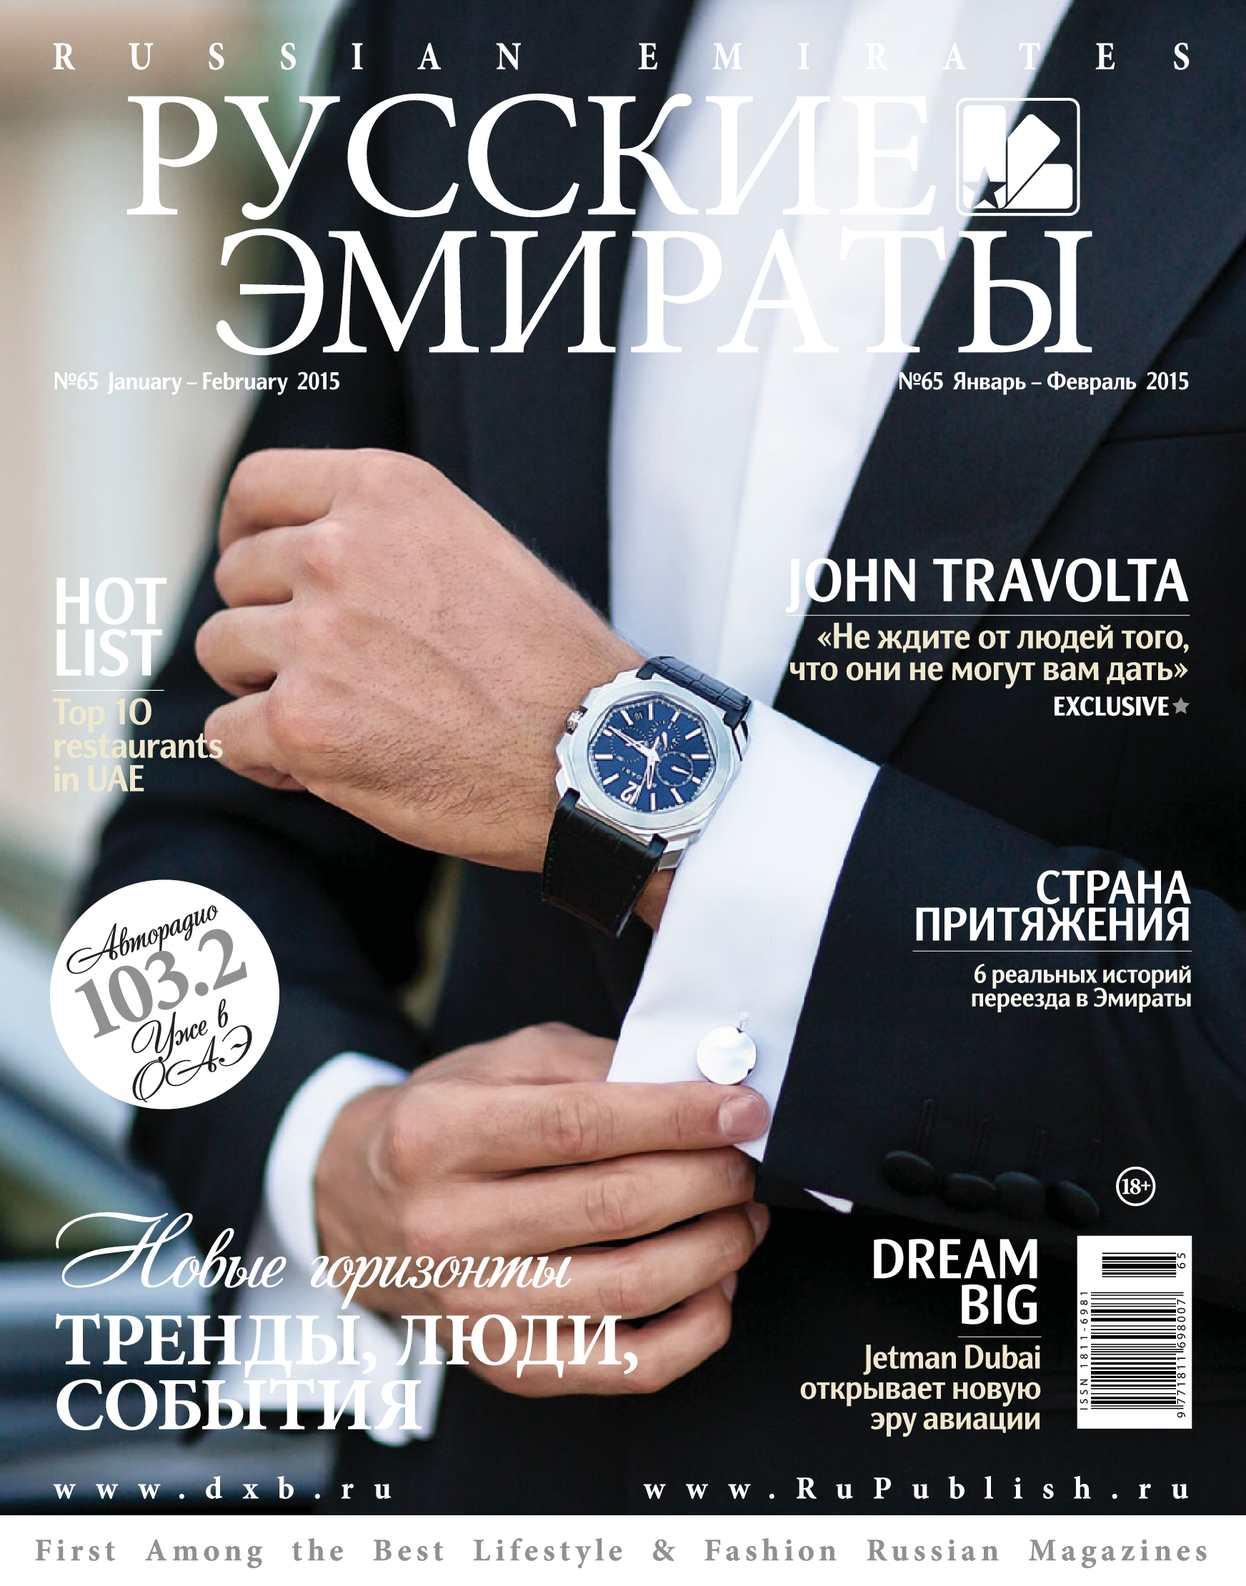 Calaméo - Russian Emirates Magazine     65   Jan - Feb 2015 4bff8fbef6d